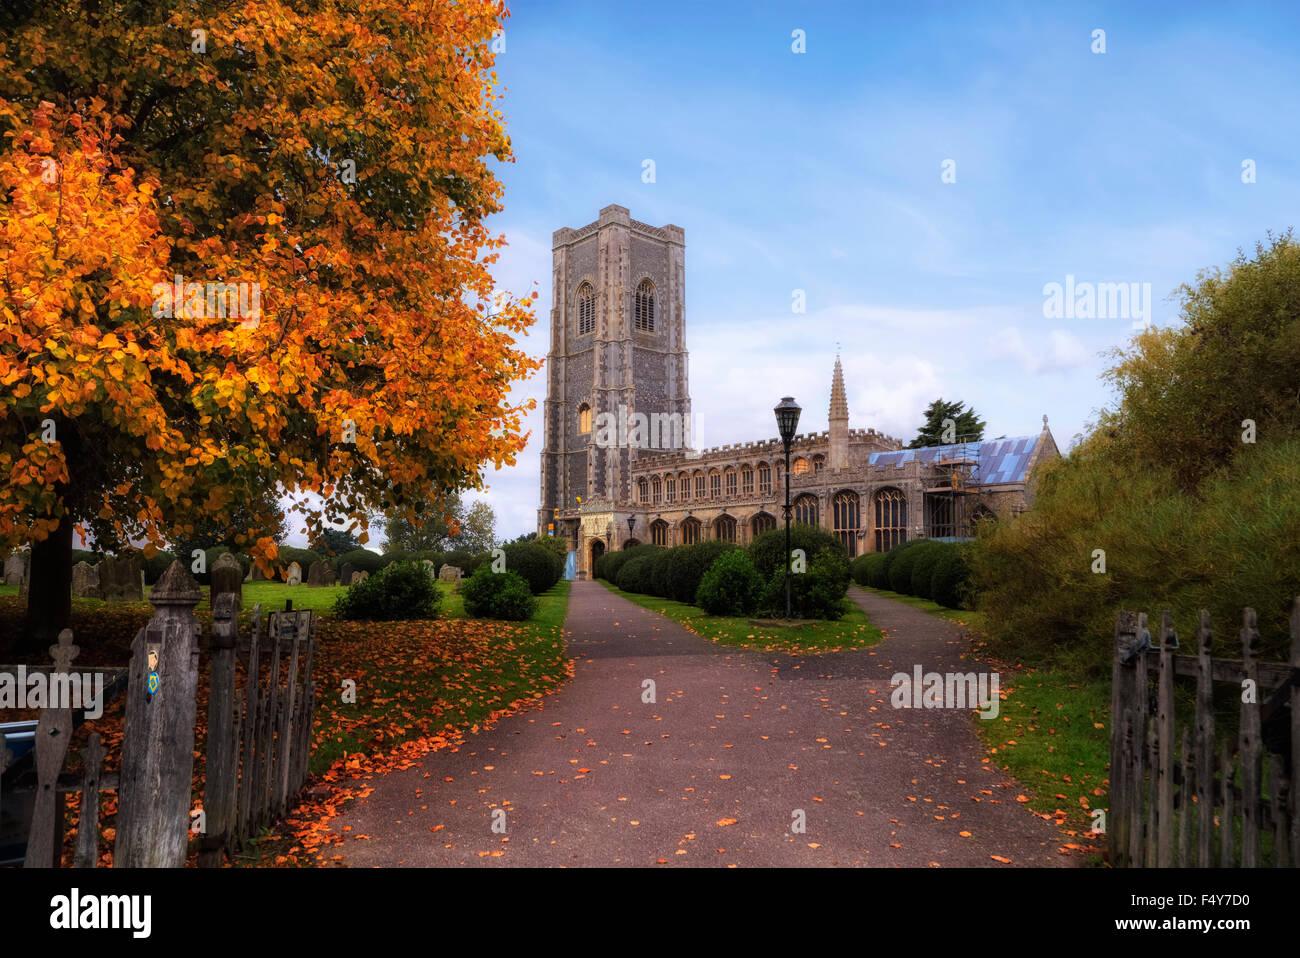 St Peter and St Paul's Church, Lavenham, Suffolk, England, United Kingdom - Stock Image